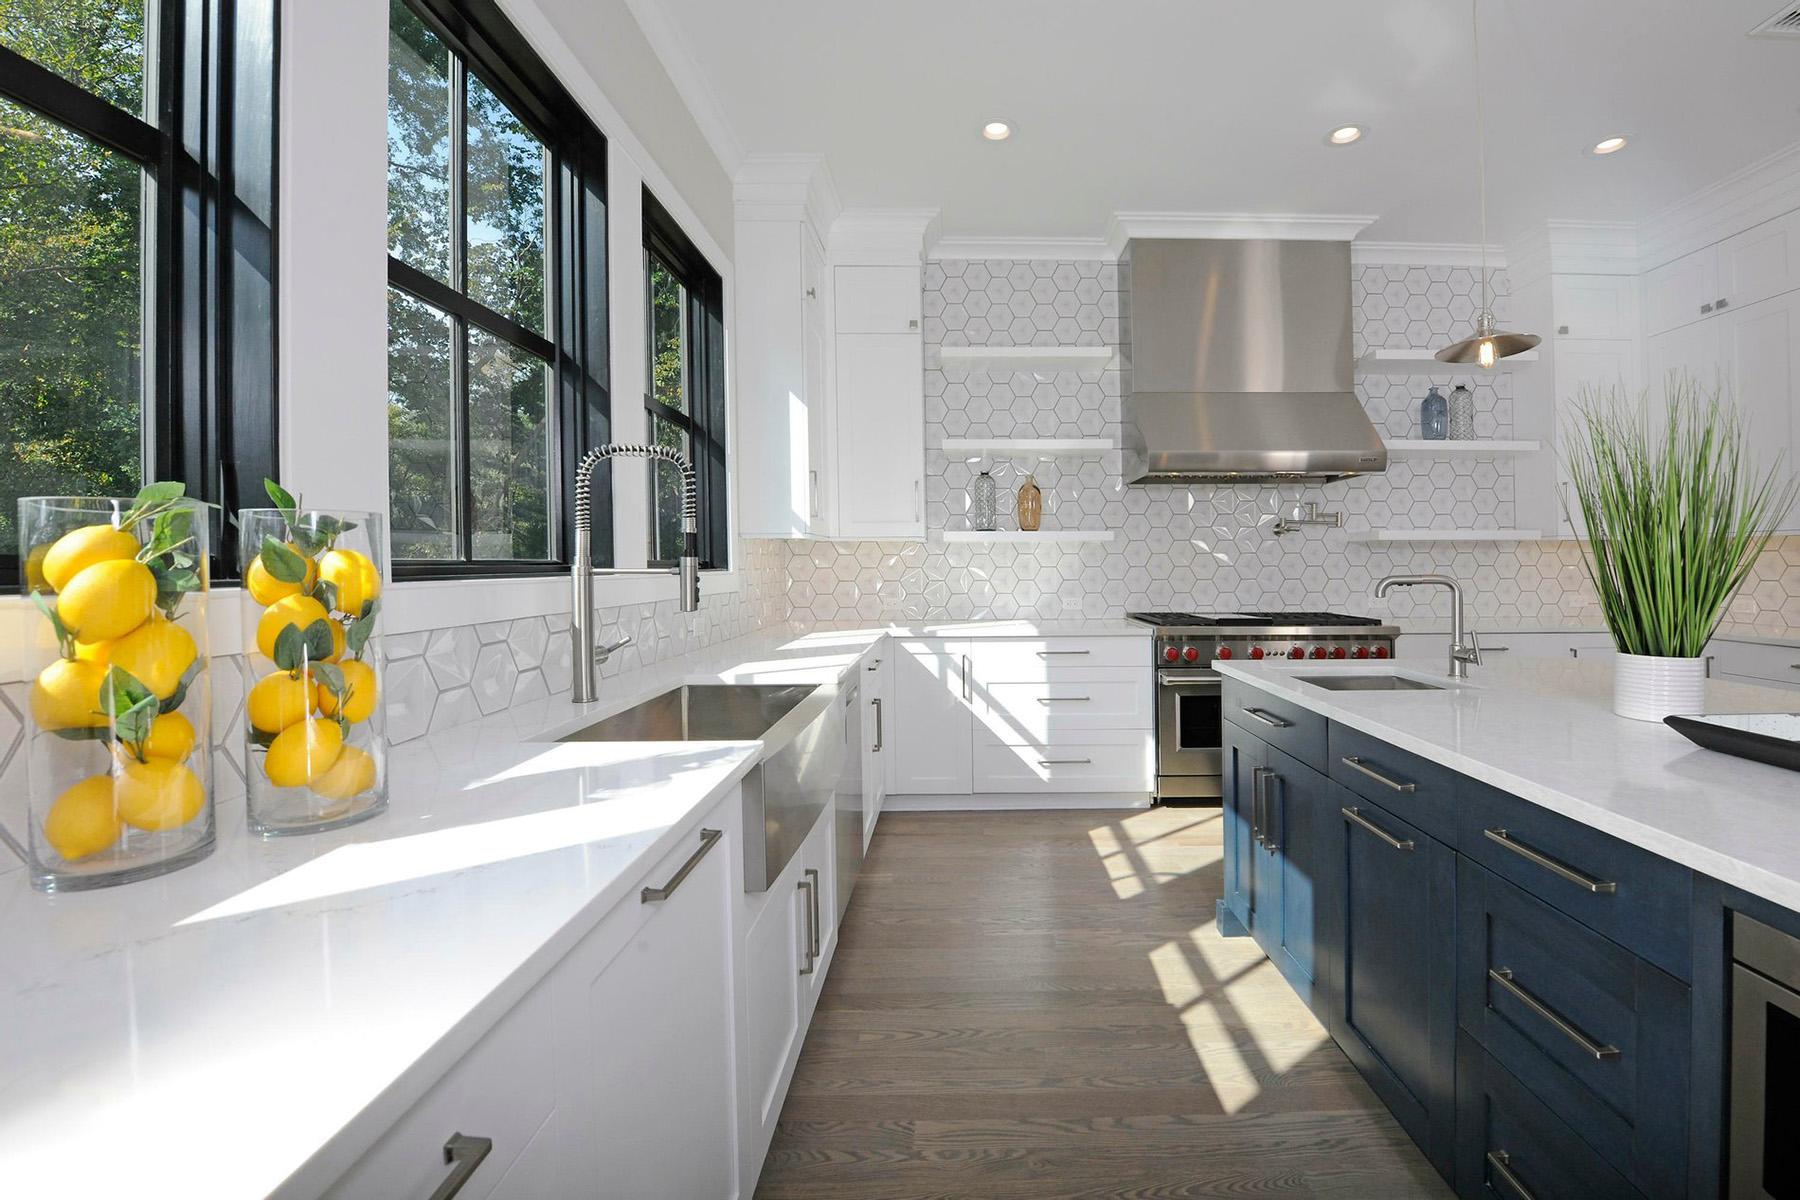 Beautiful kitchen with white countertops & black windows.